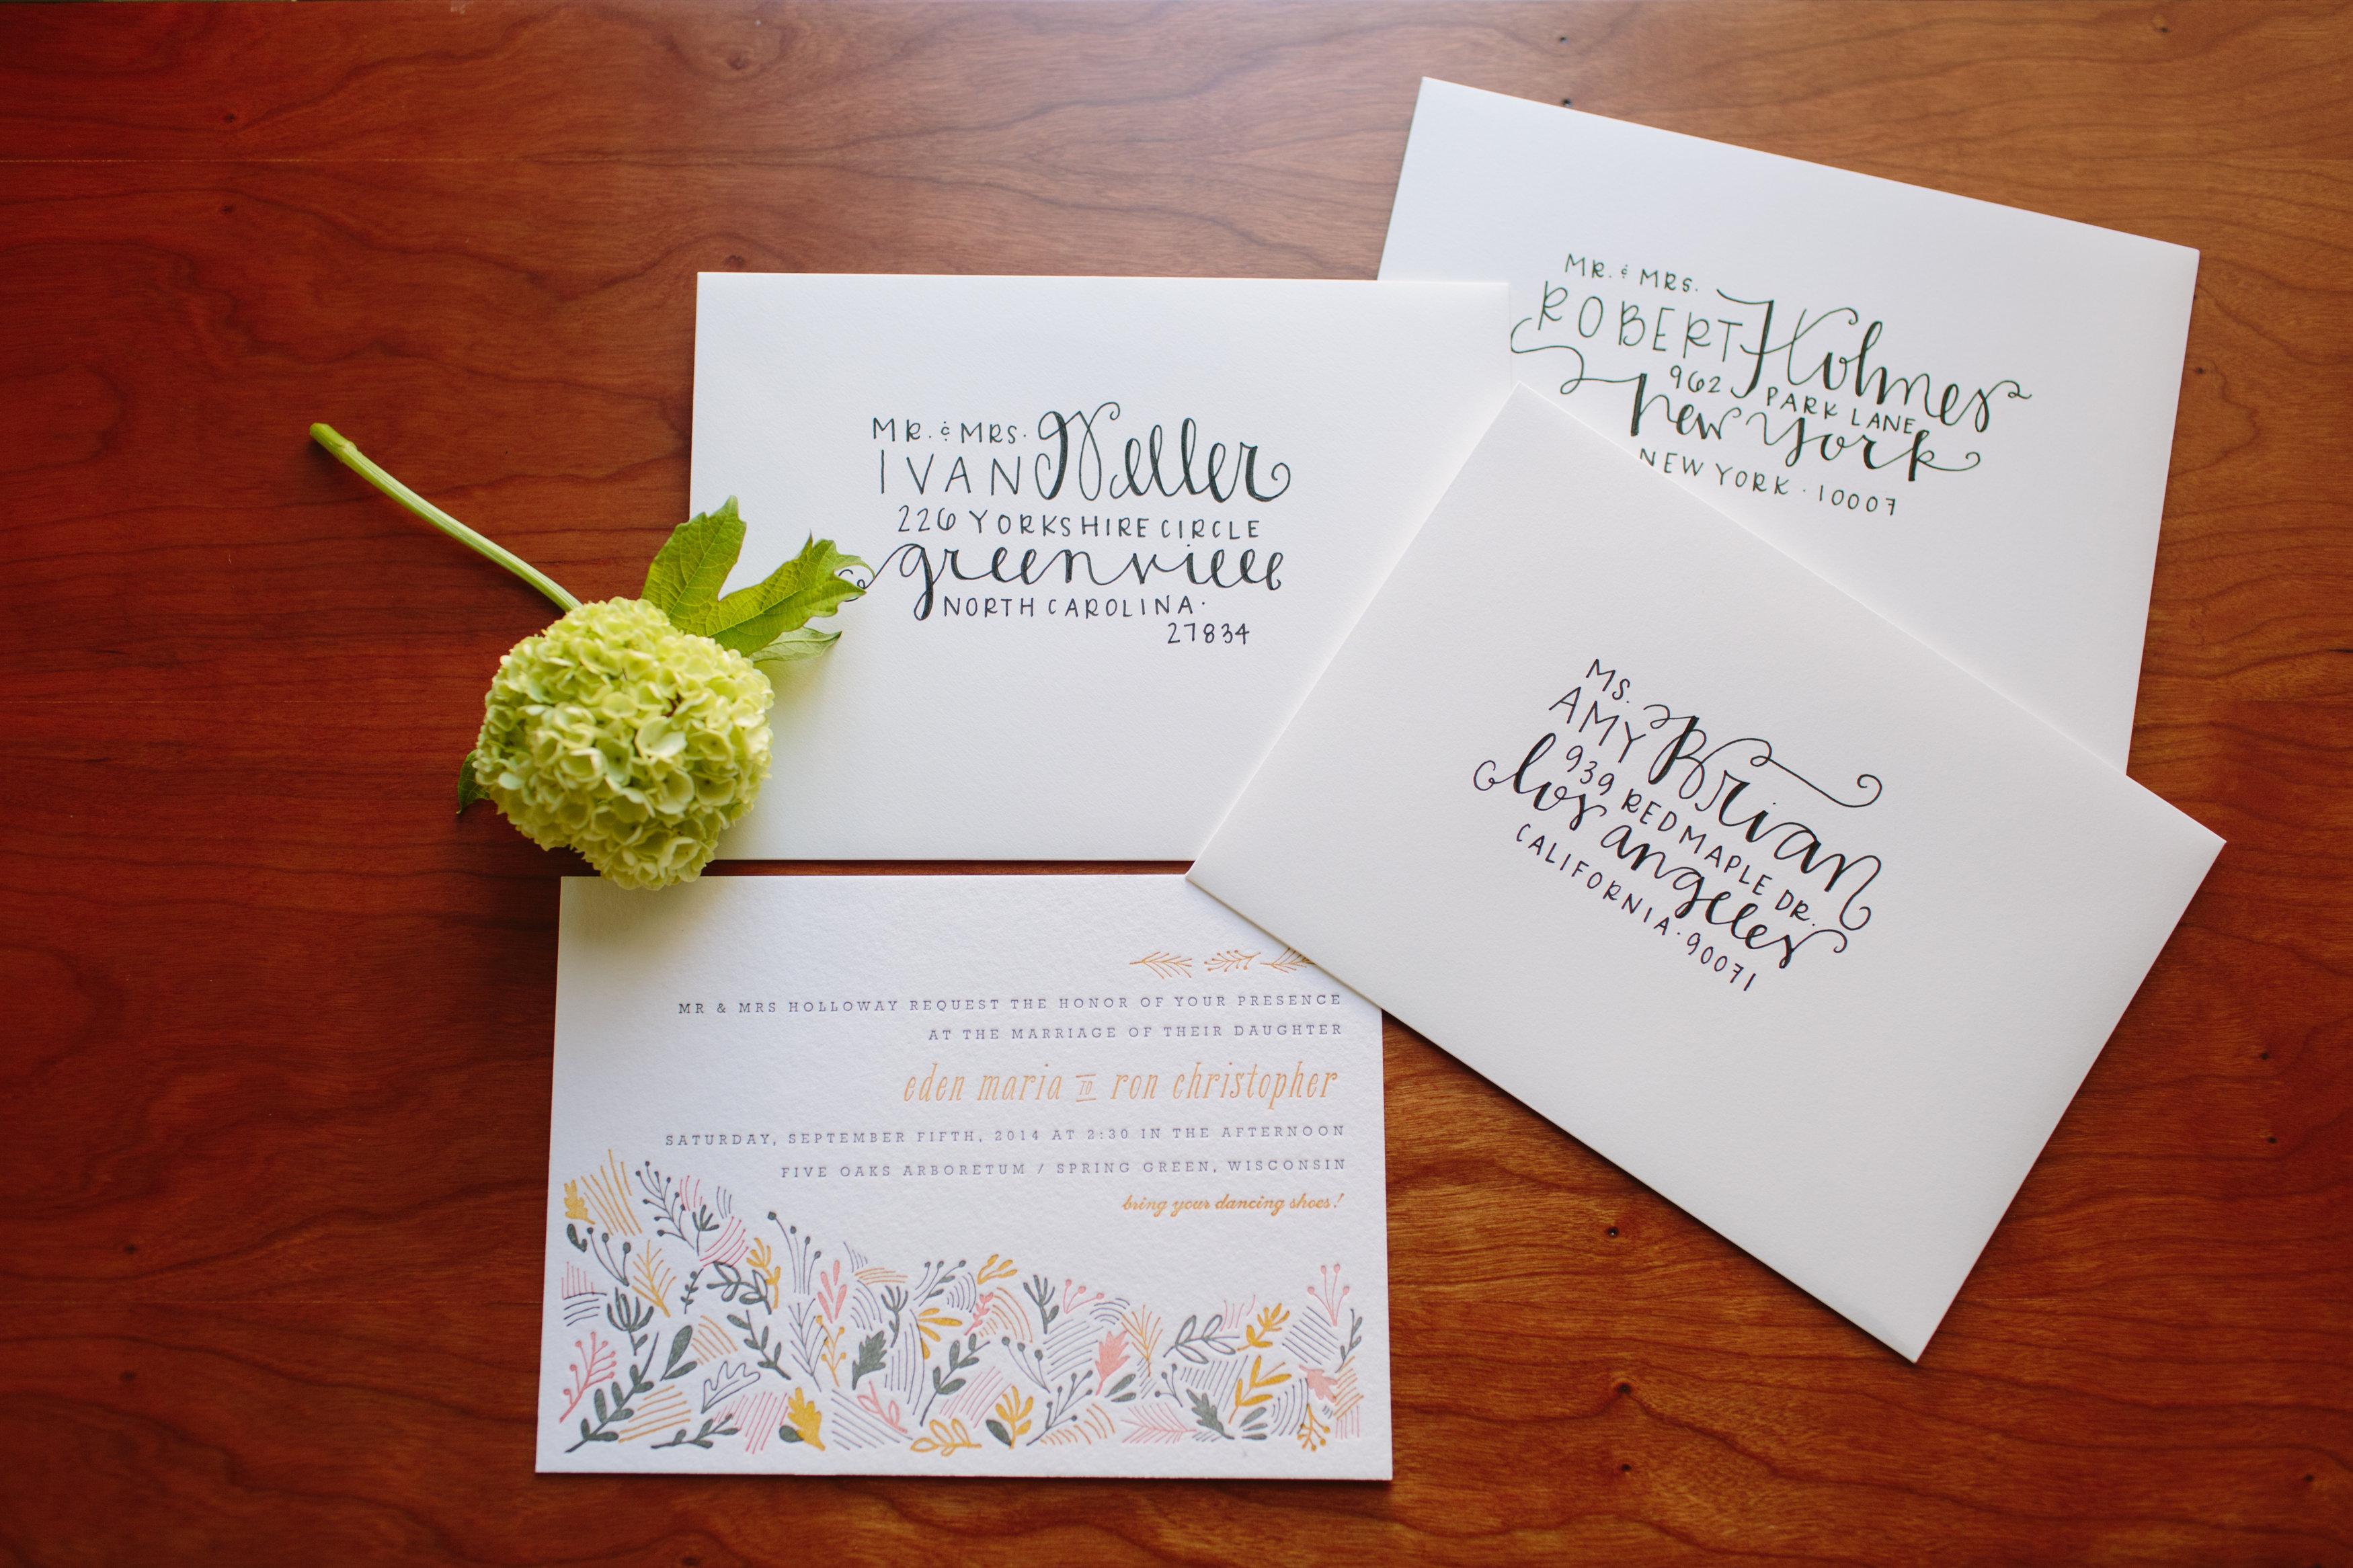 diy wedding envelope addressing tips wedding invitation envelopes I